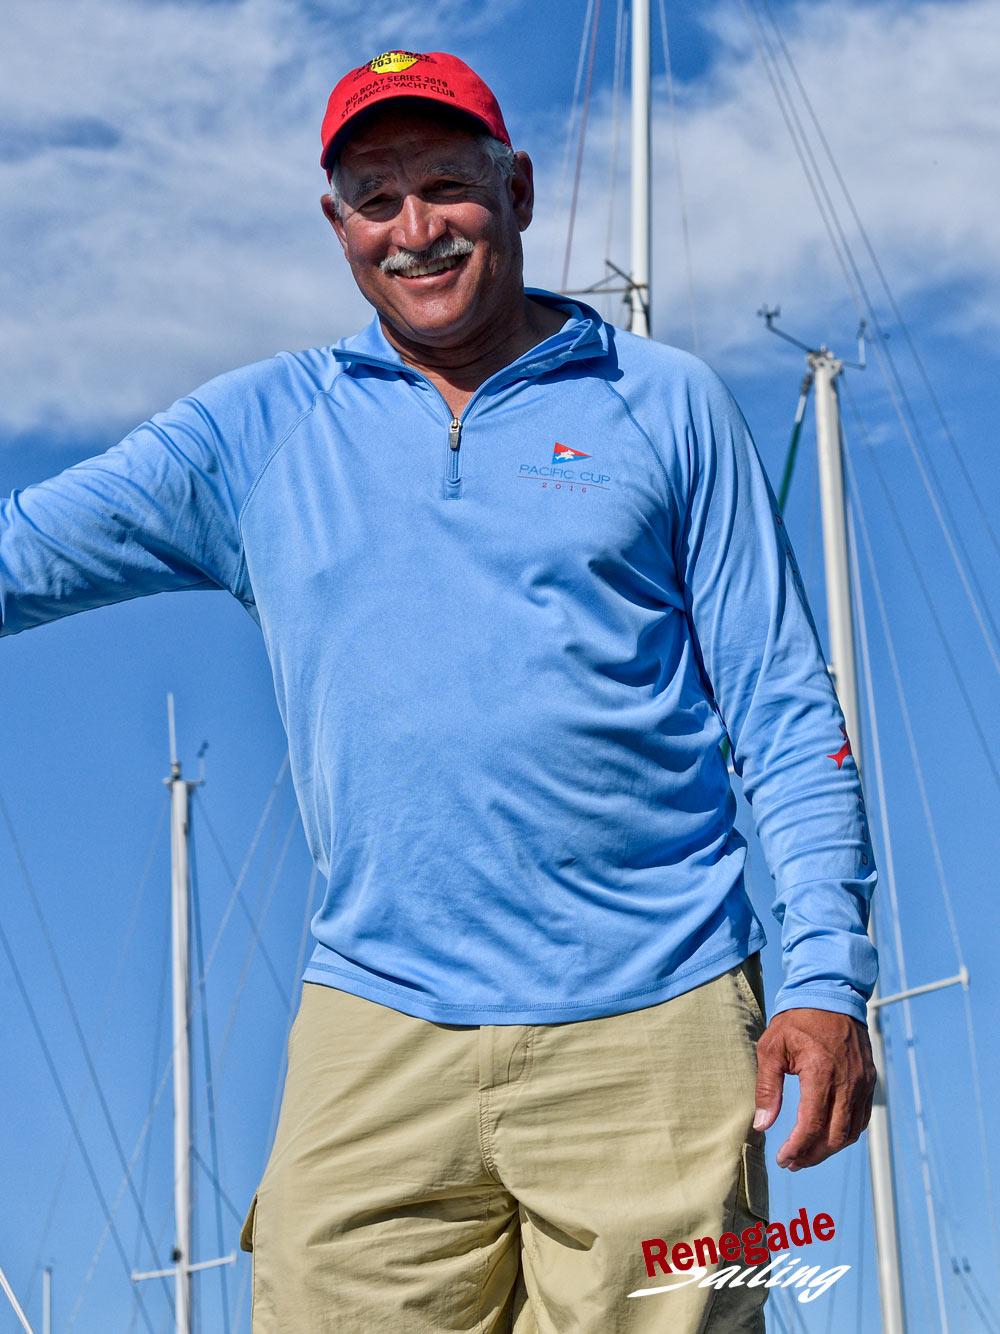 Winning skipper Shawn Ivie sailed  Limitless  to 2-1-1-1-4-1.